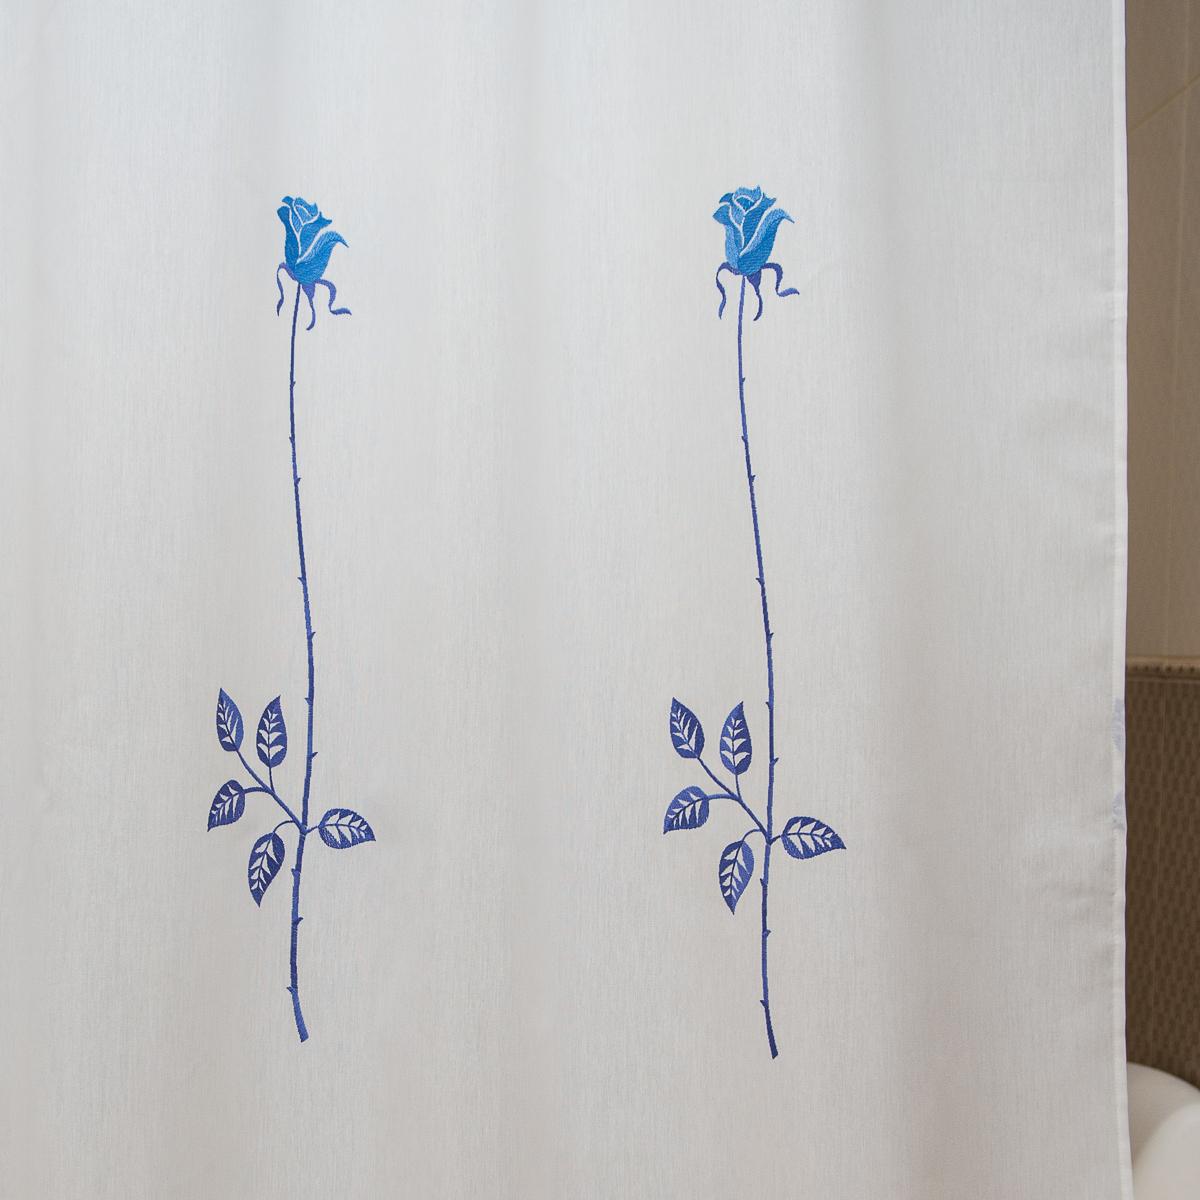 Шторки Шторка для ванной 180x200 Arti-Deco Rosas C. Blue elitnaya-shtorka-dlya-vannoy-rosas-c-blue-ot-arti-deco-ispaniya.jpg